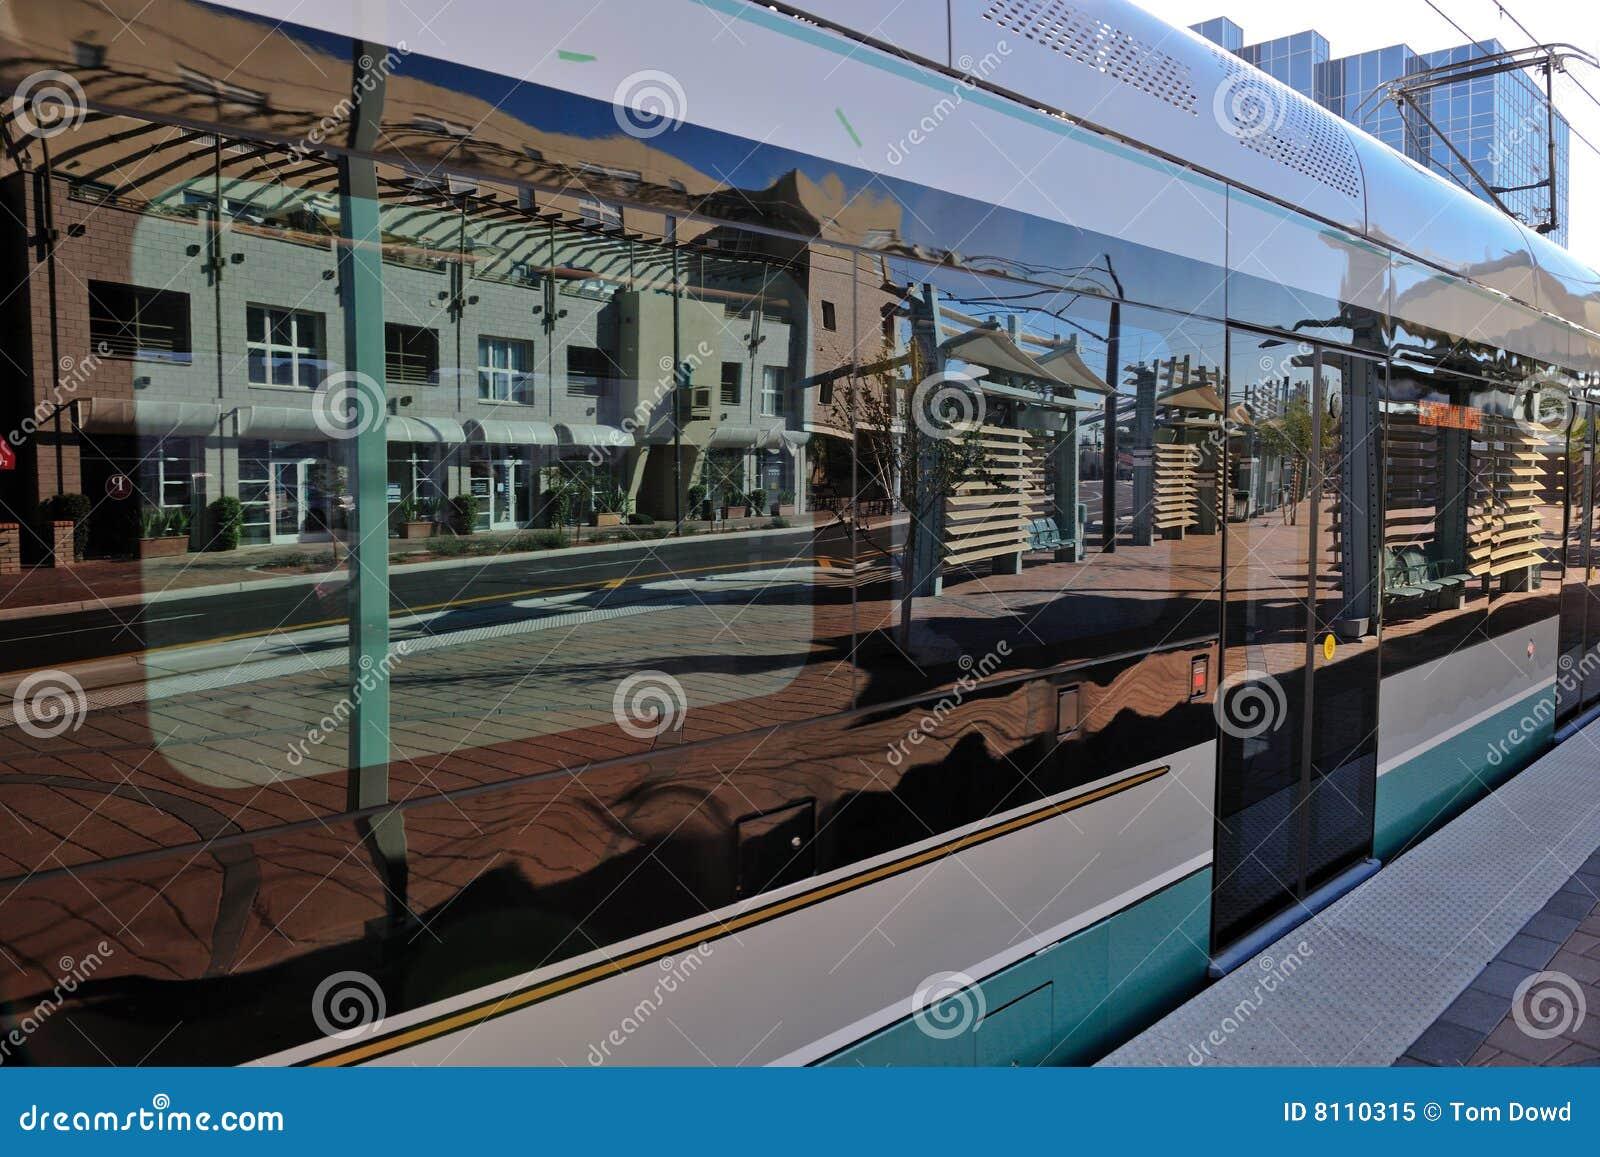 Light rail train carriage royalty free stock photo image 8110315 - Carrage metro ...